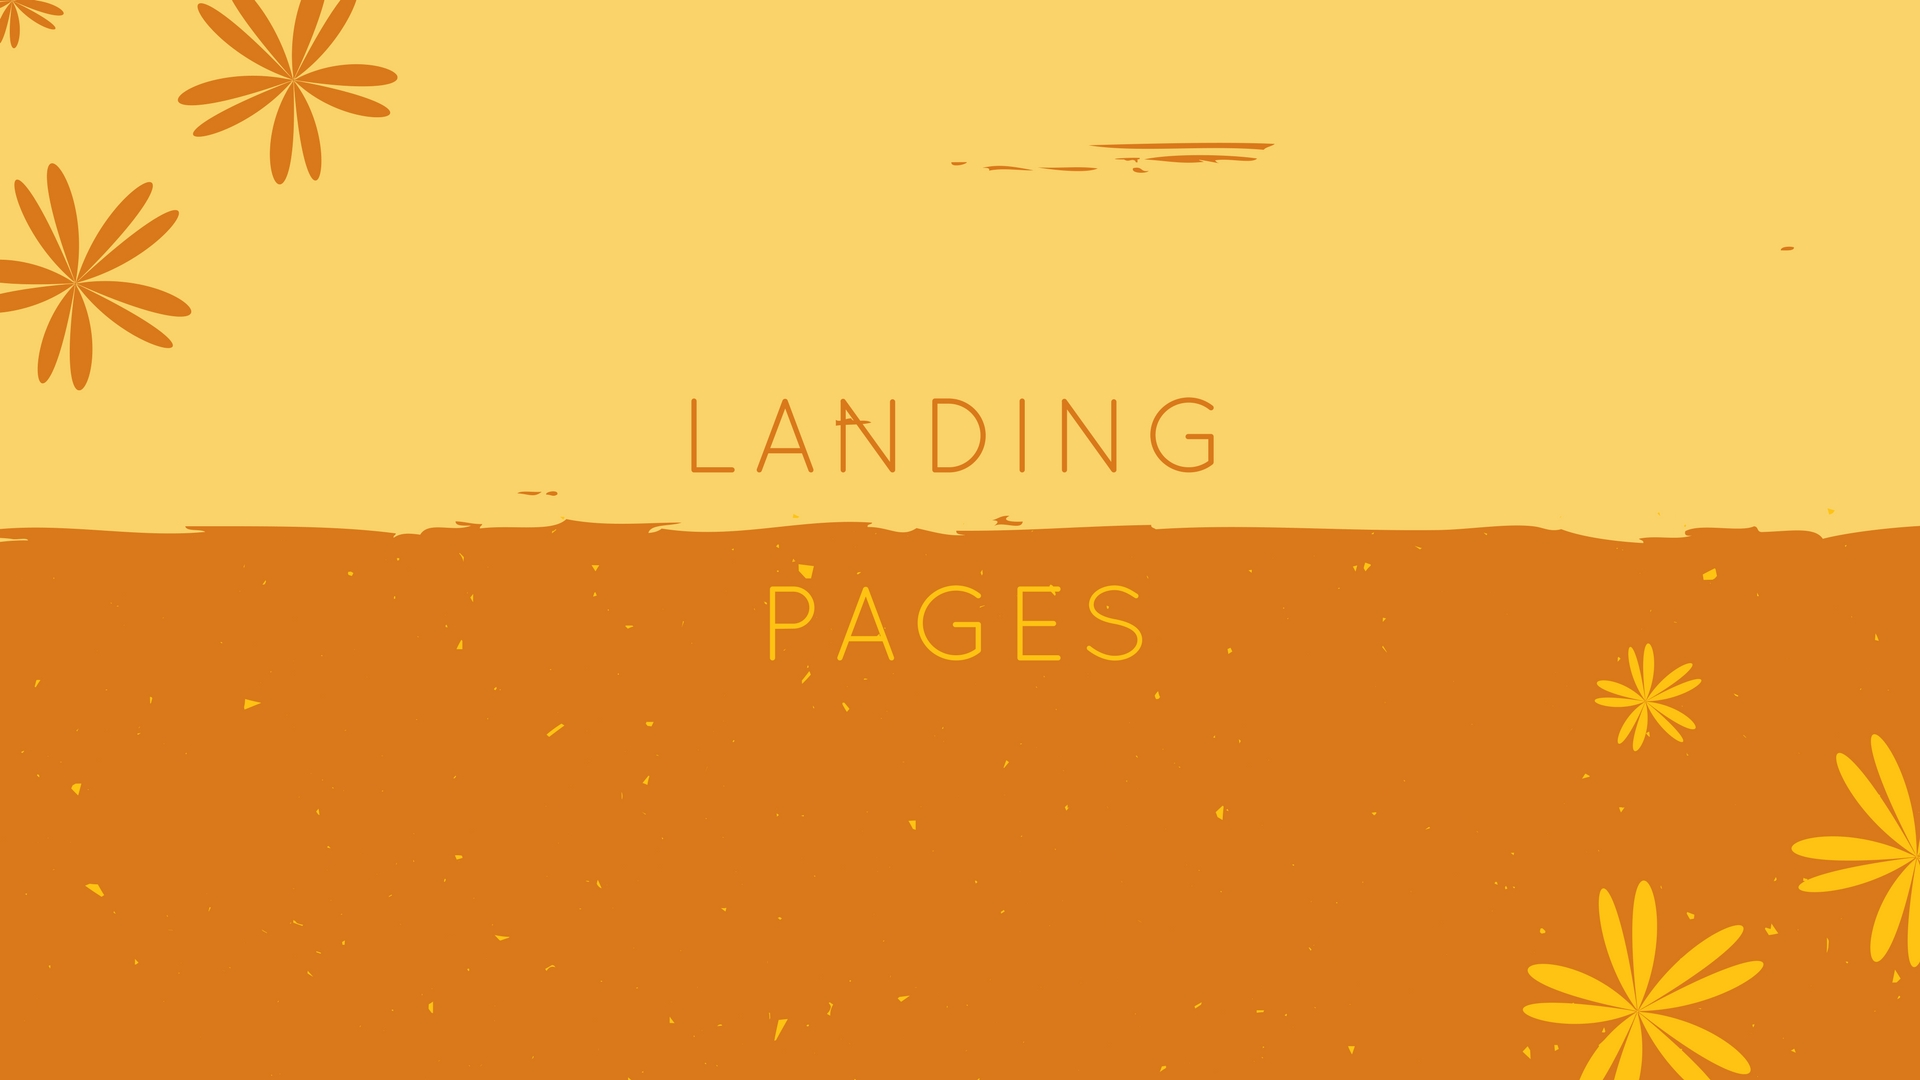 Online Copywriter Melinda J. Irvine creates landing pages that convert